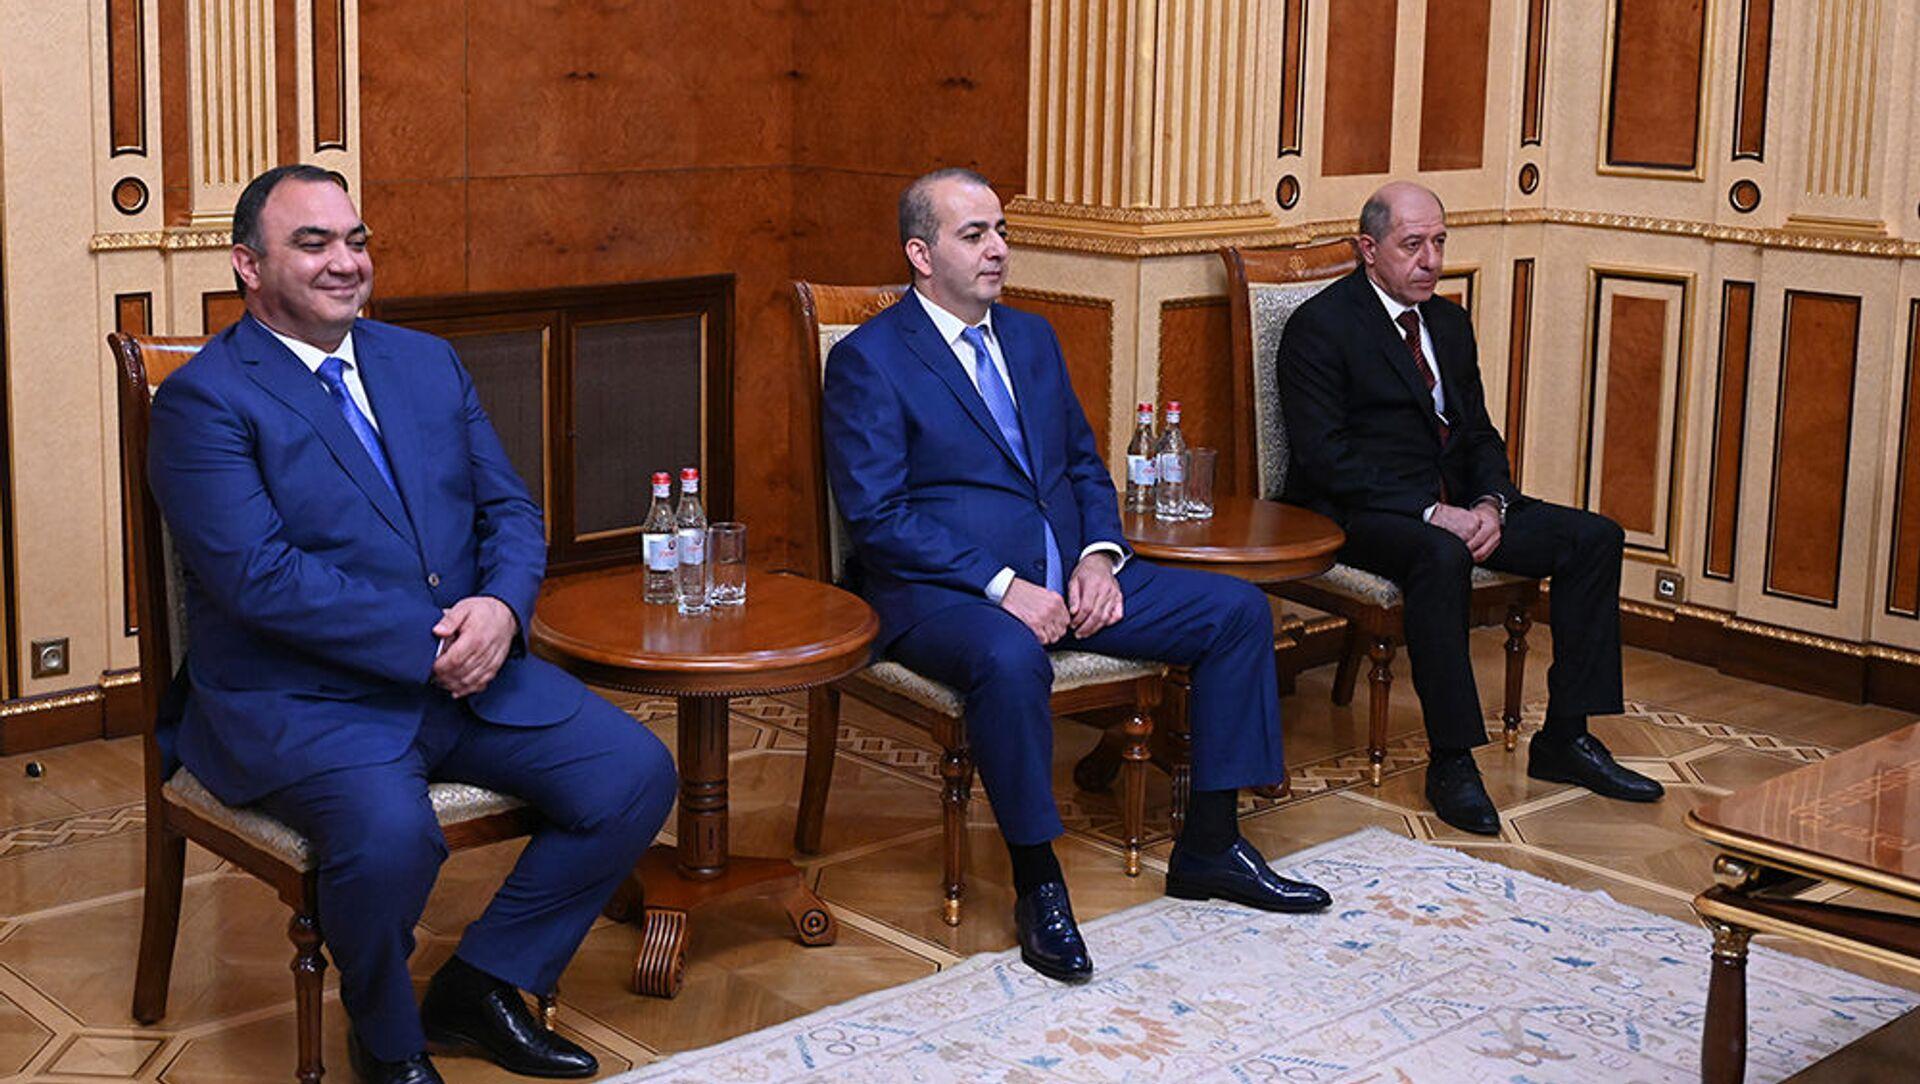 Руководители полиции, СНБ и СГБ Армении - Sputnik Արմենիա, 1920, 13.07.2021